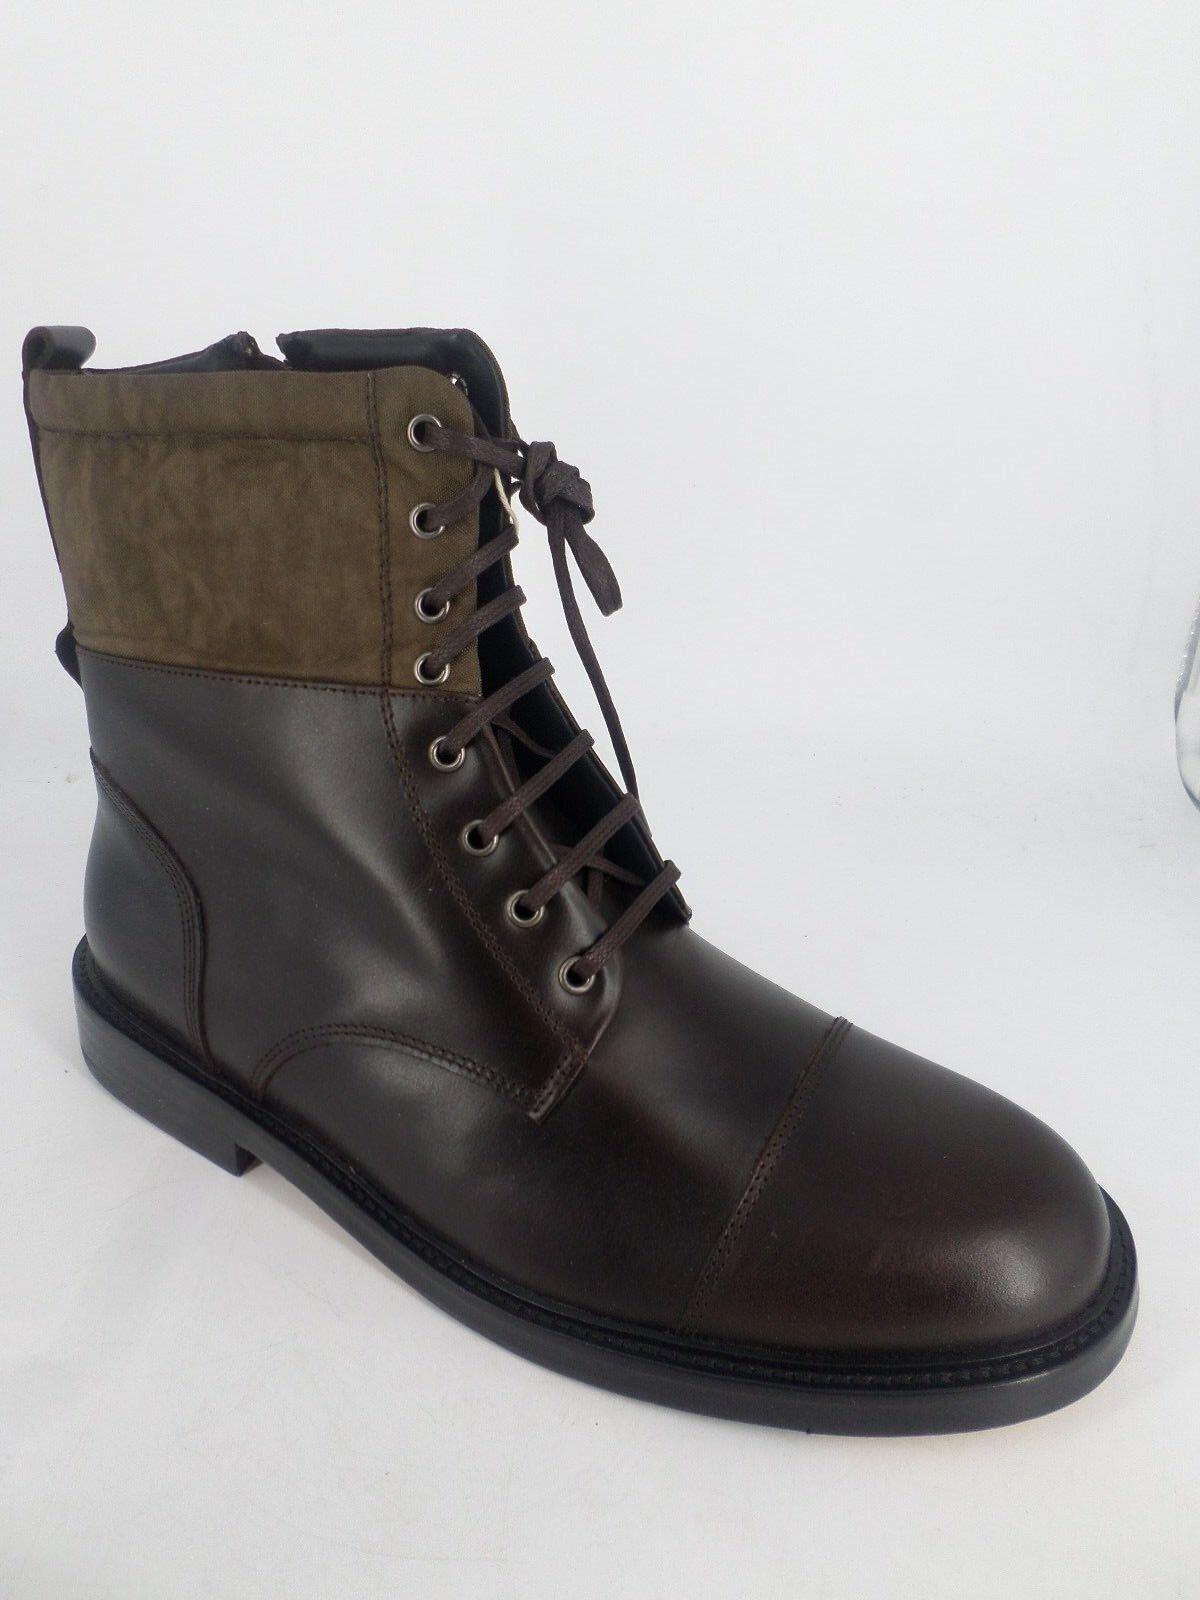 Royal Republiq tediq Dandy Zip Boot Brown EU 42 LN41 65